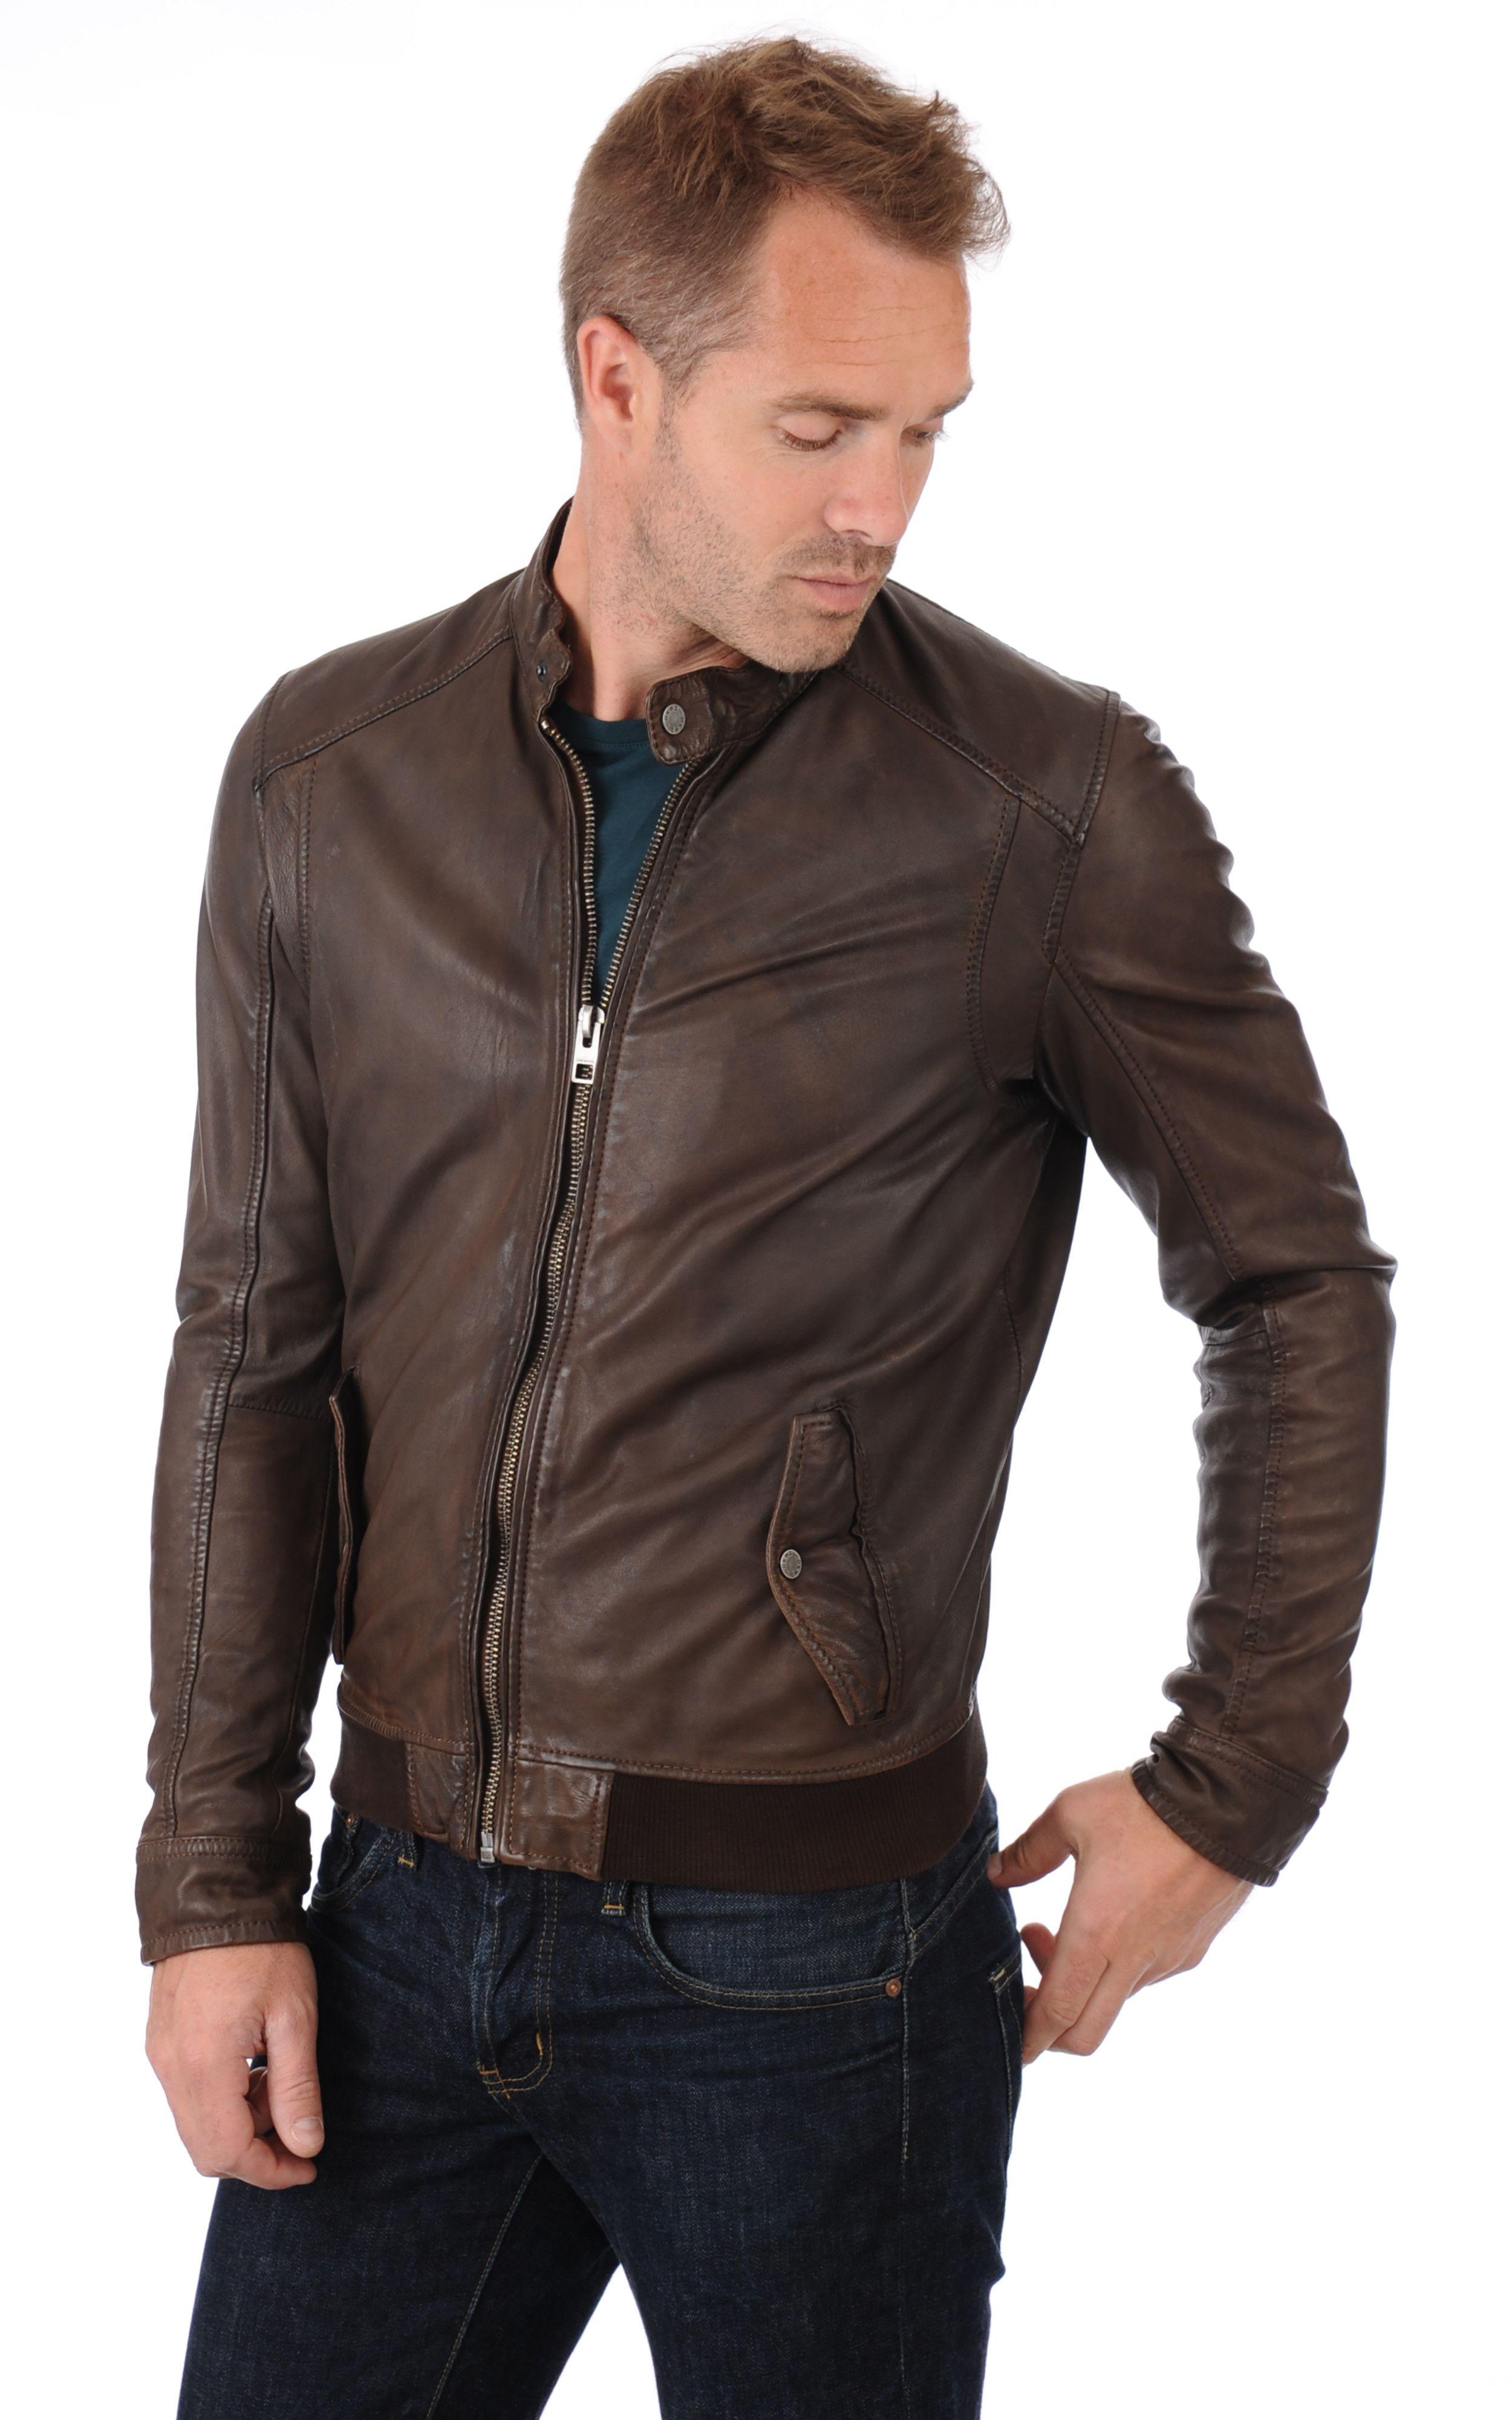 020dd114560d Blouson Cuir Marron Homme Oakwood   Leather   Jeans   Pinterest ...